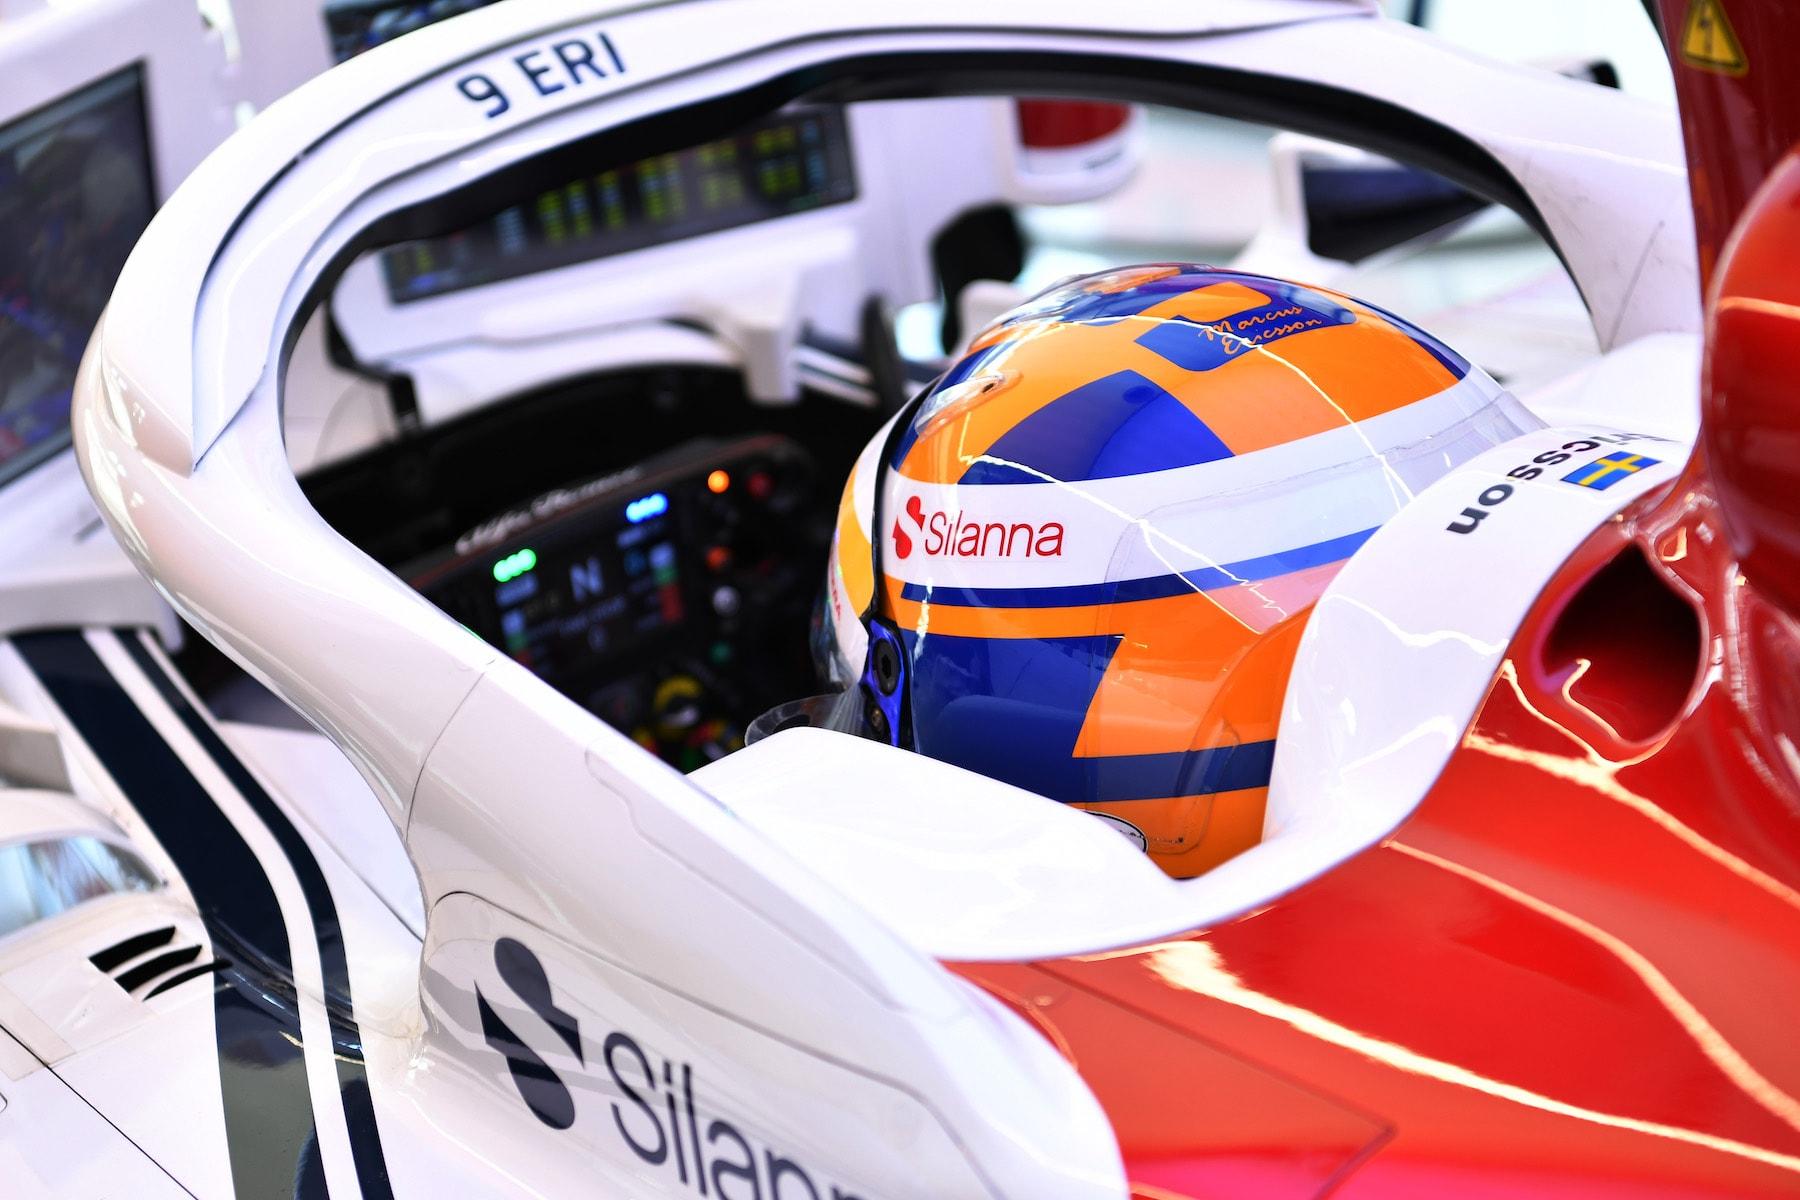 2018 Marcus Ericsson | Sauber C37 | 2018 Japanese GP 2 copy.jpg